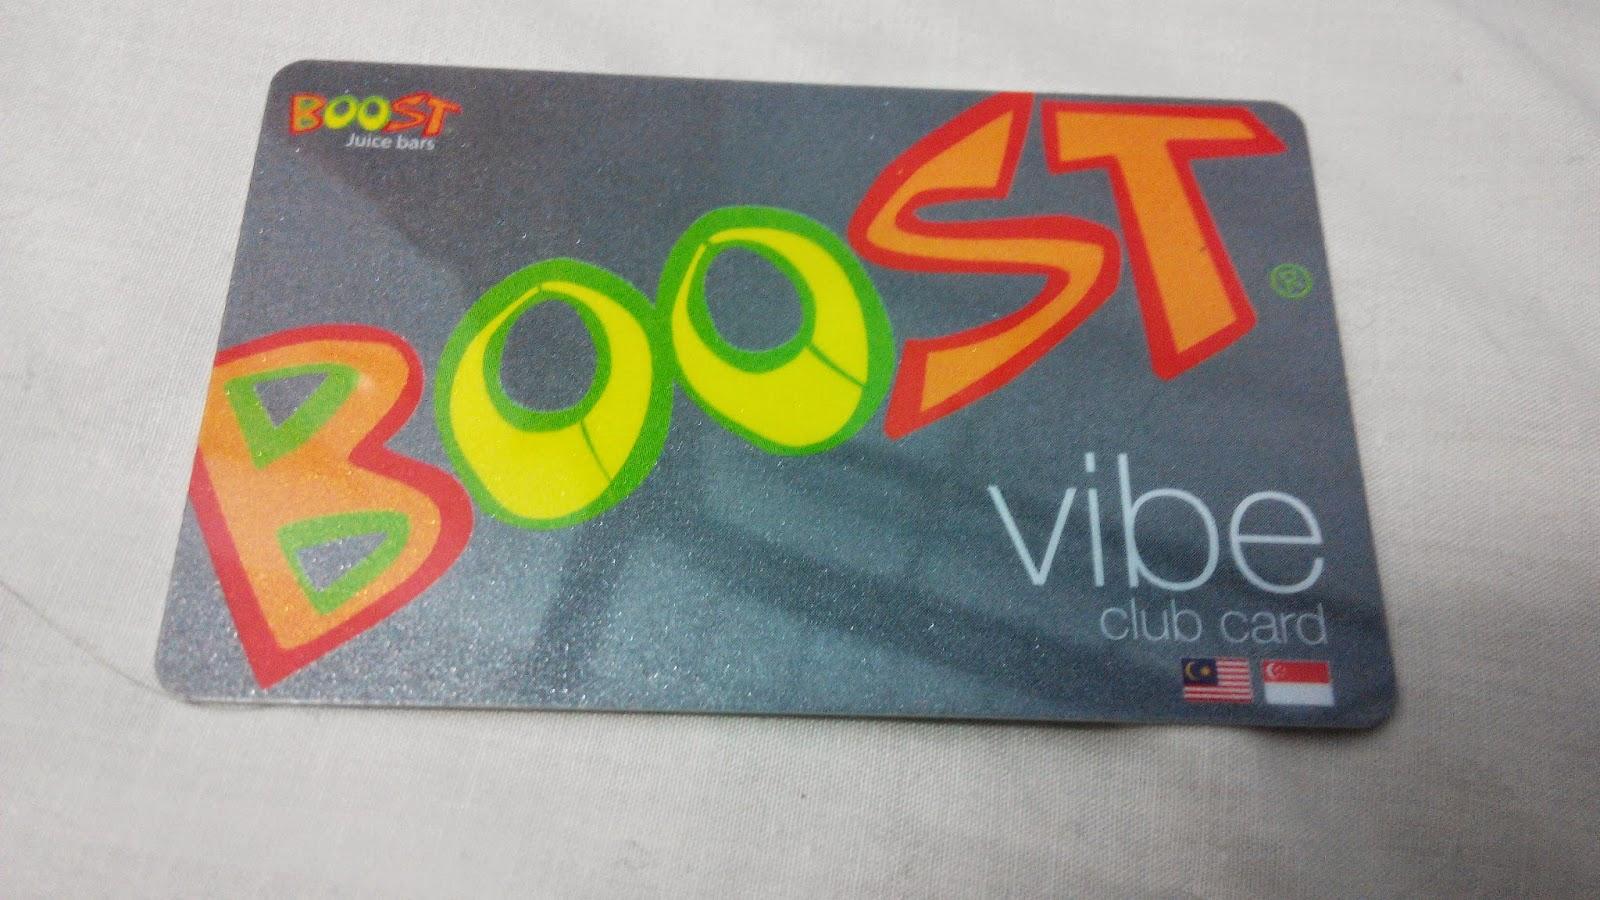 Boost Vibe Club Card